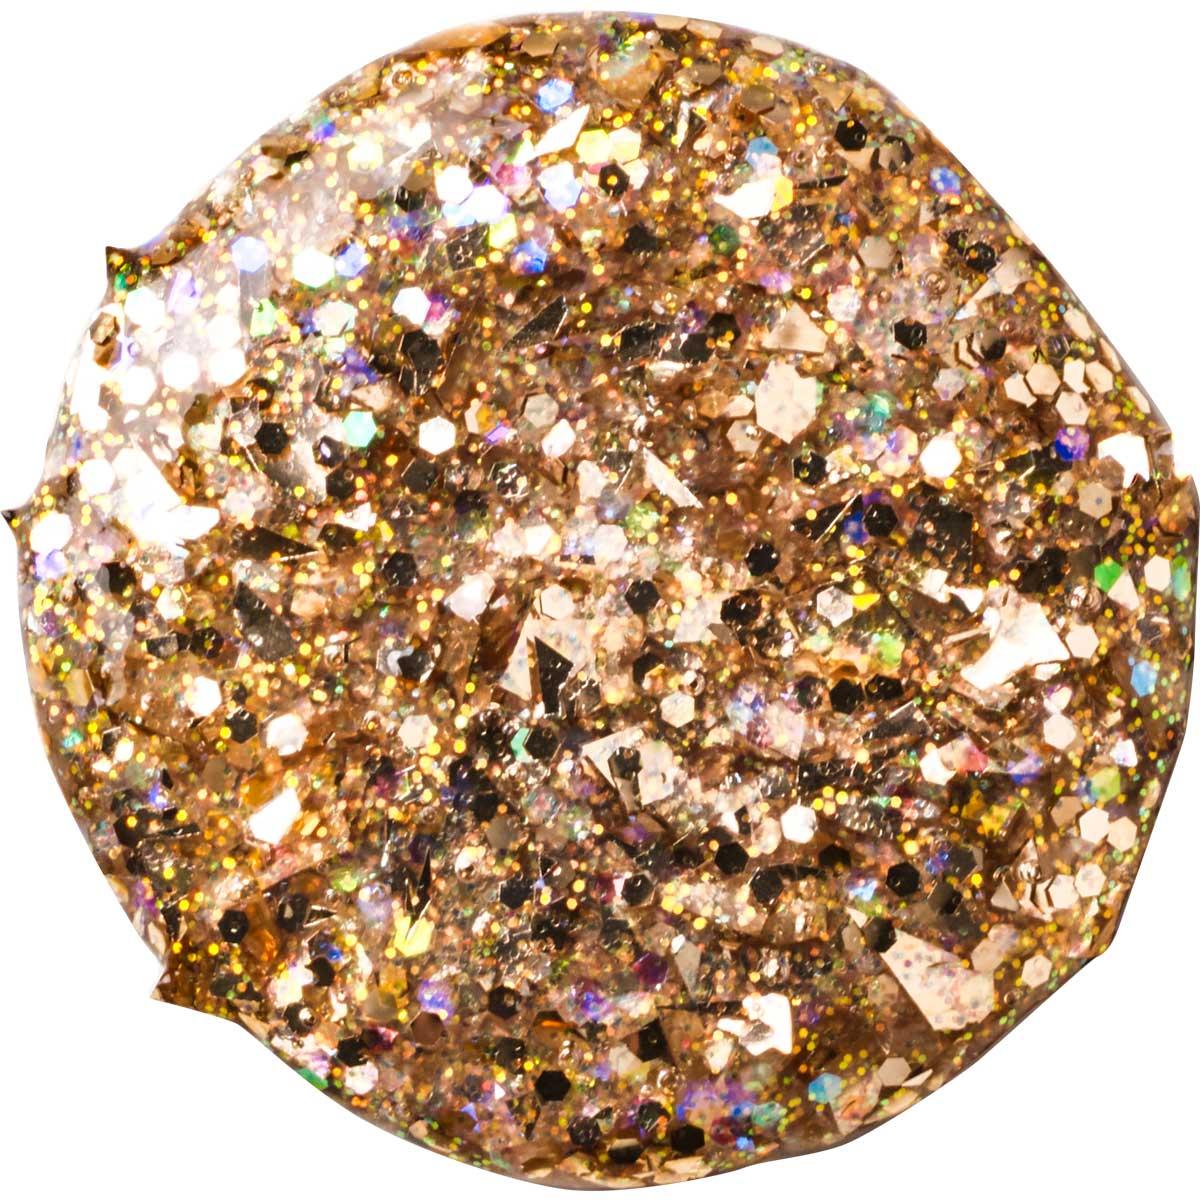 FolkArt ® Glitterific™ Acrylic Paint - Rose Gold, 2 oz.